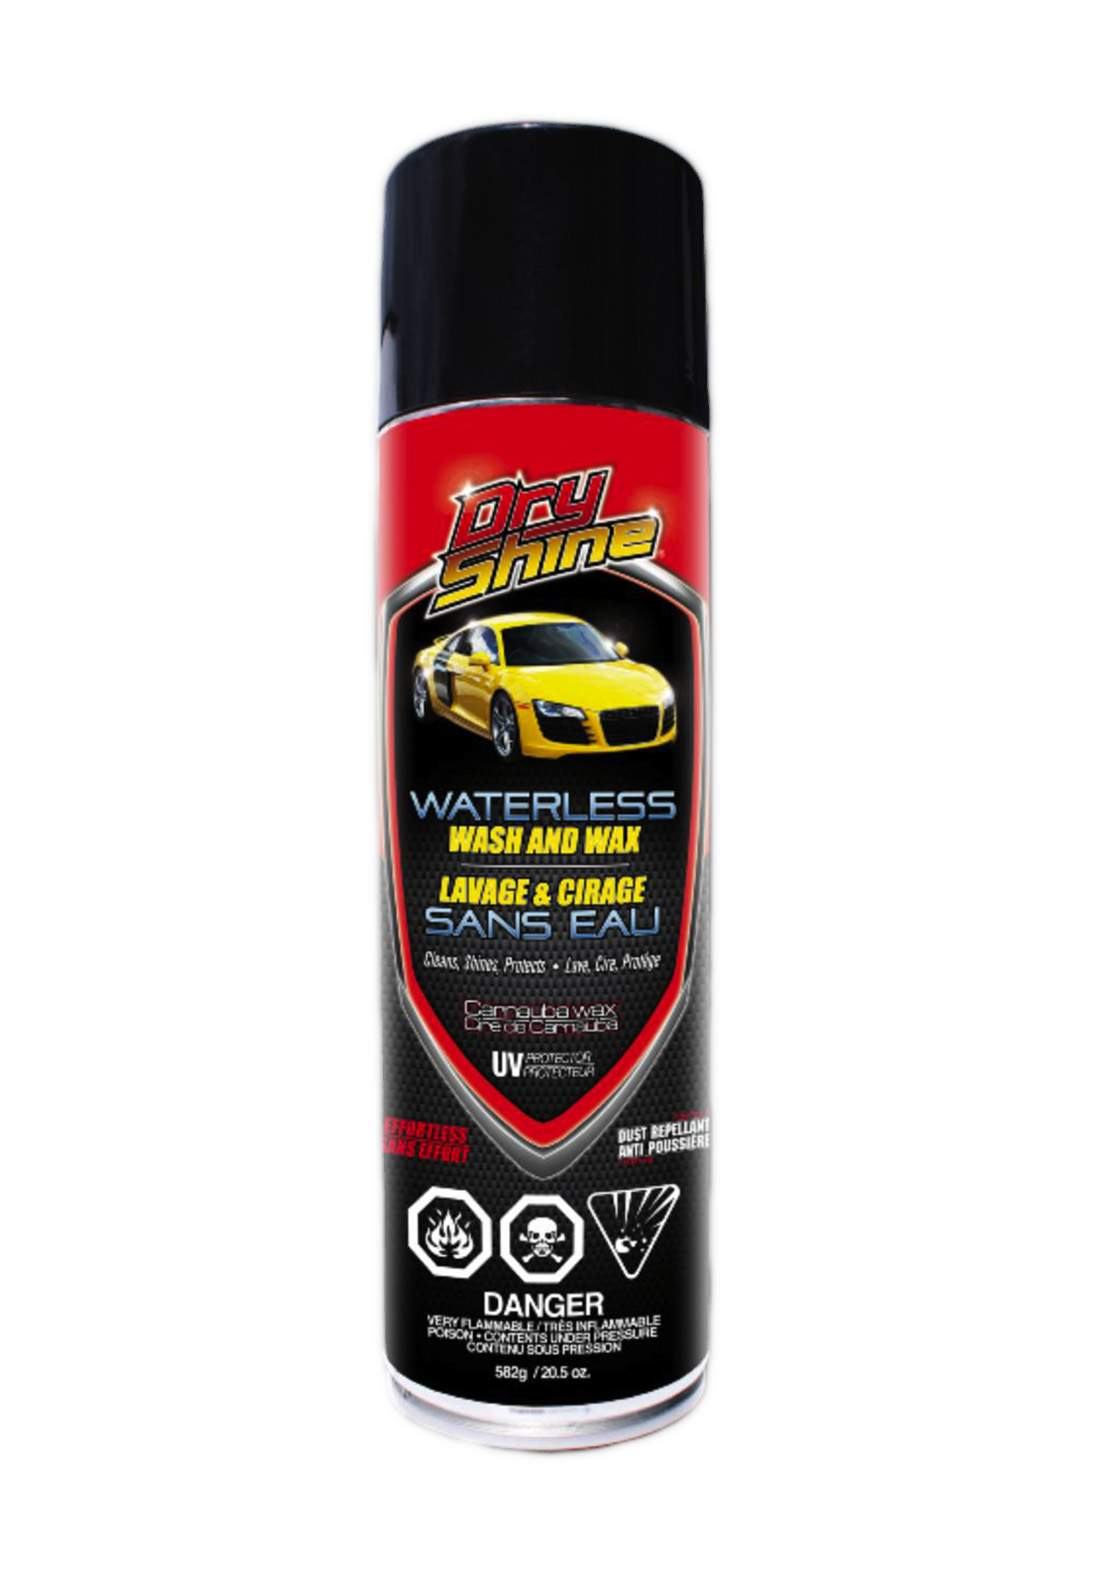 Dry Shine Waterless Car Wash & Wax 582 g  منظف شمع وغسيل جاف للسيارة بدون ماء